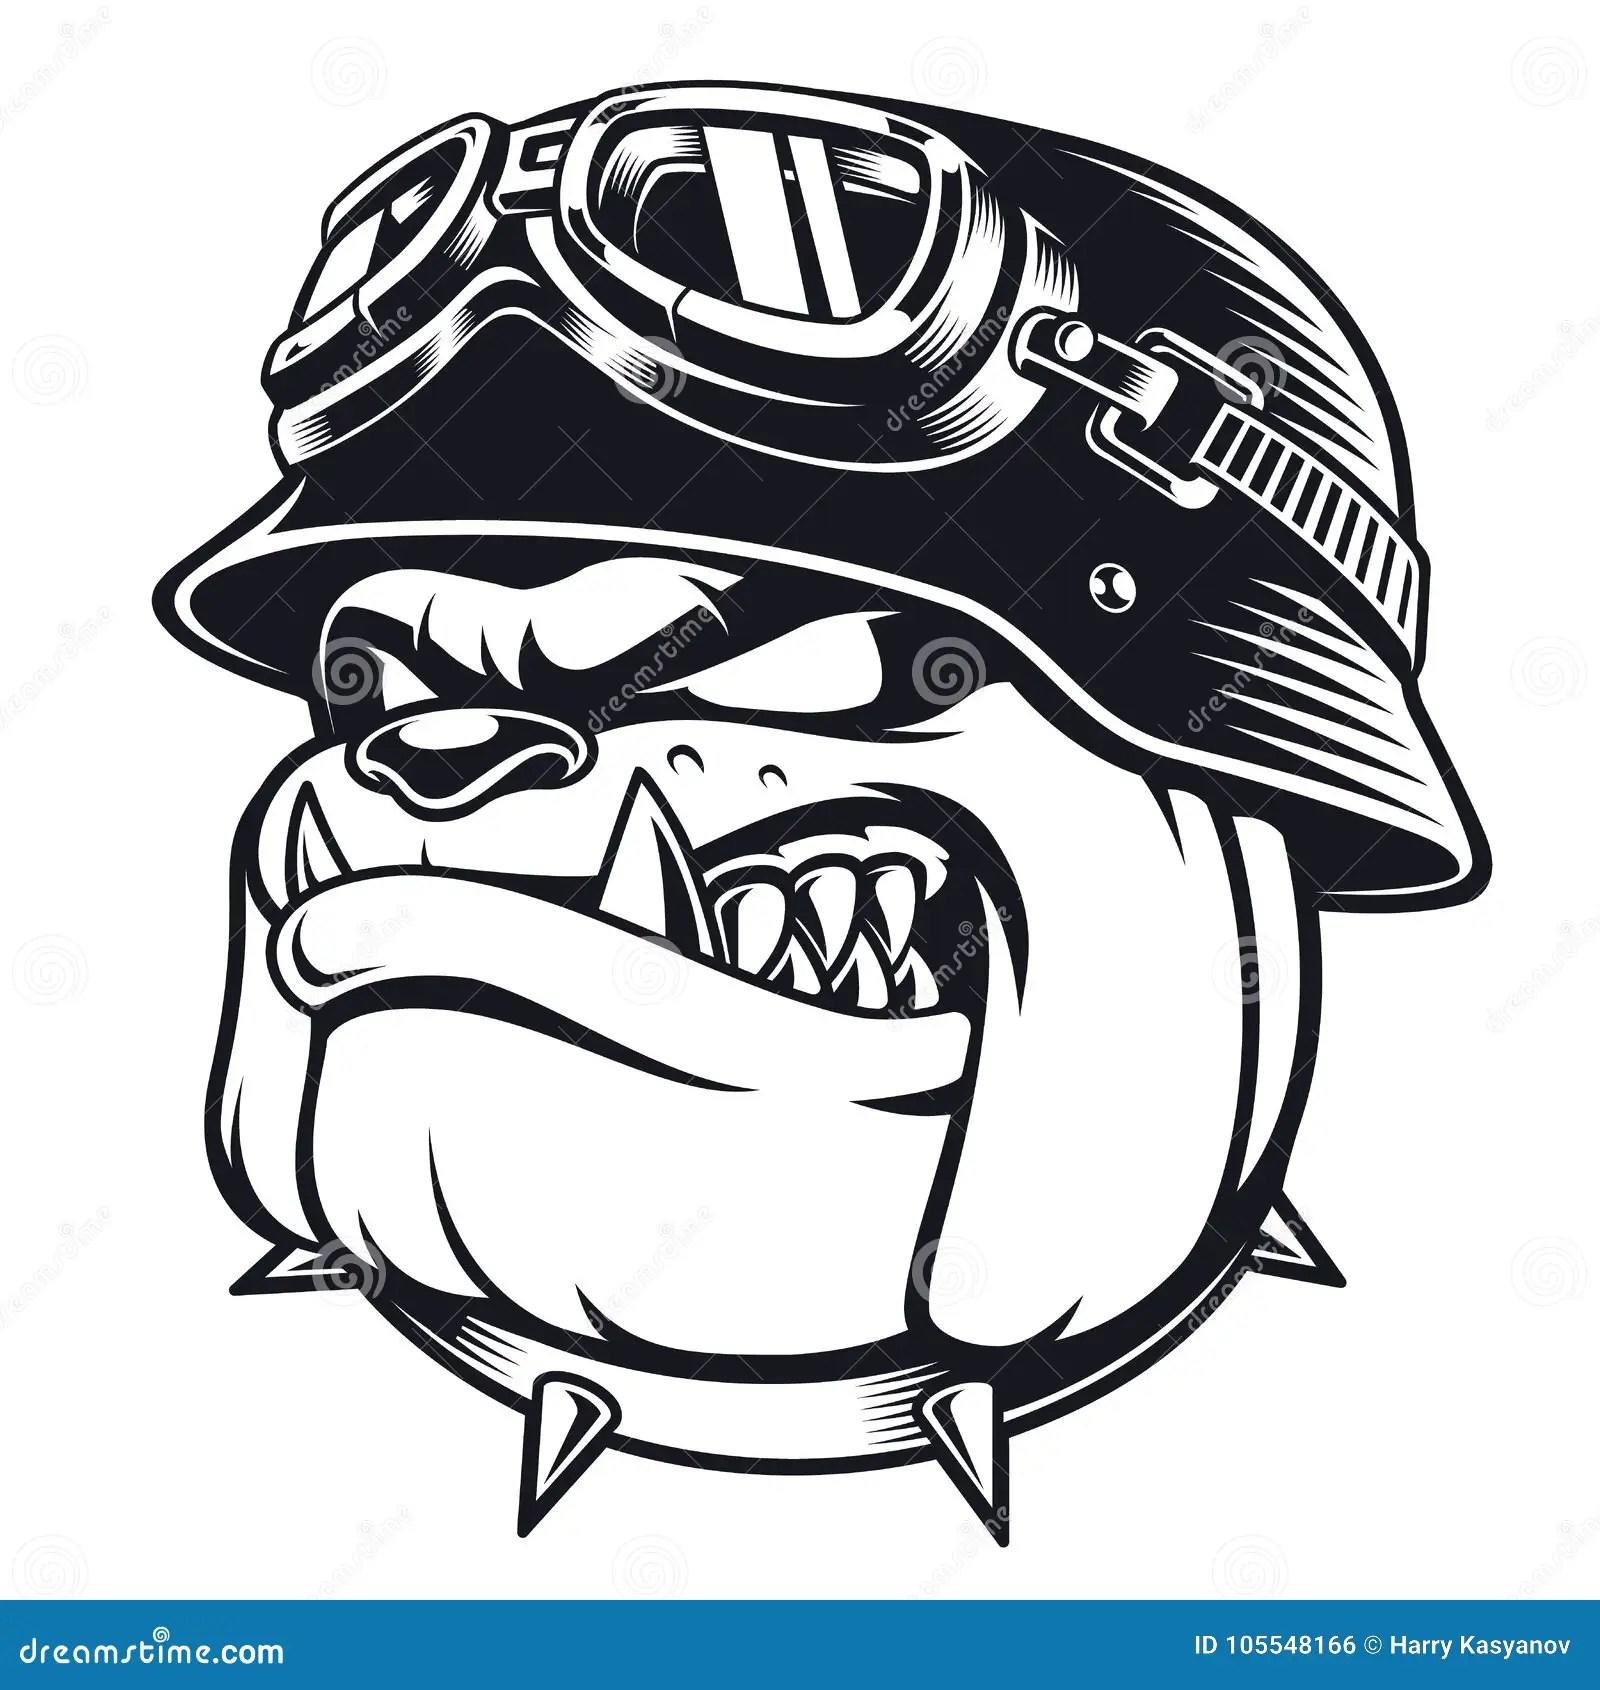 Bulldog Cartoons Illustrations Amp Vector Stock Images